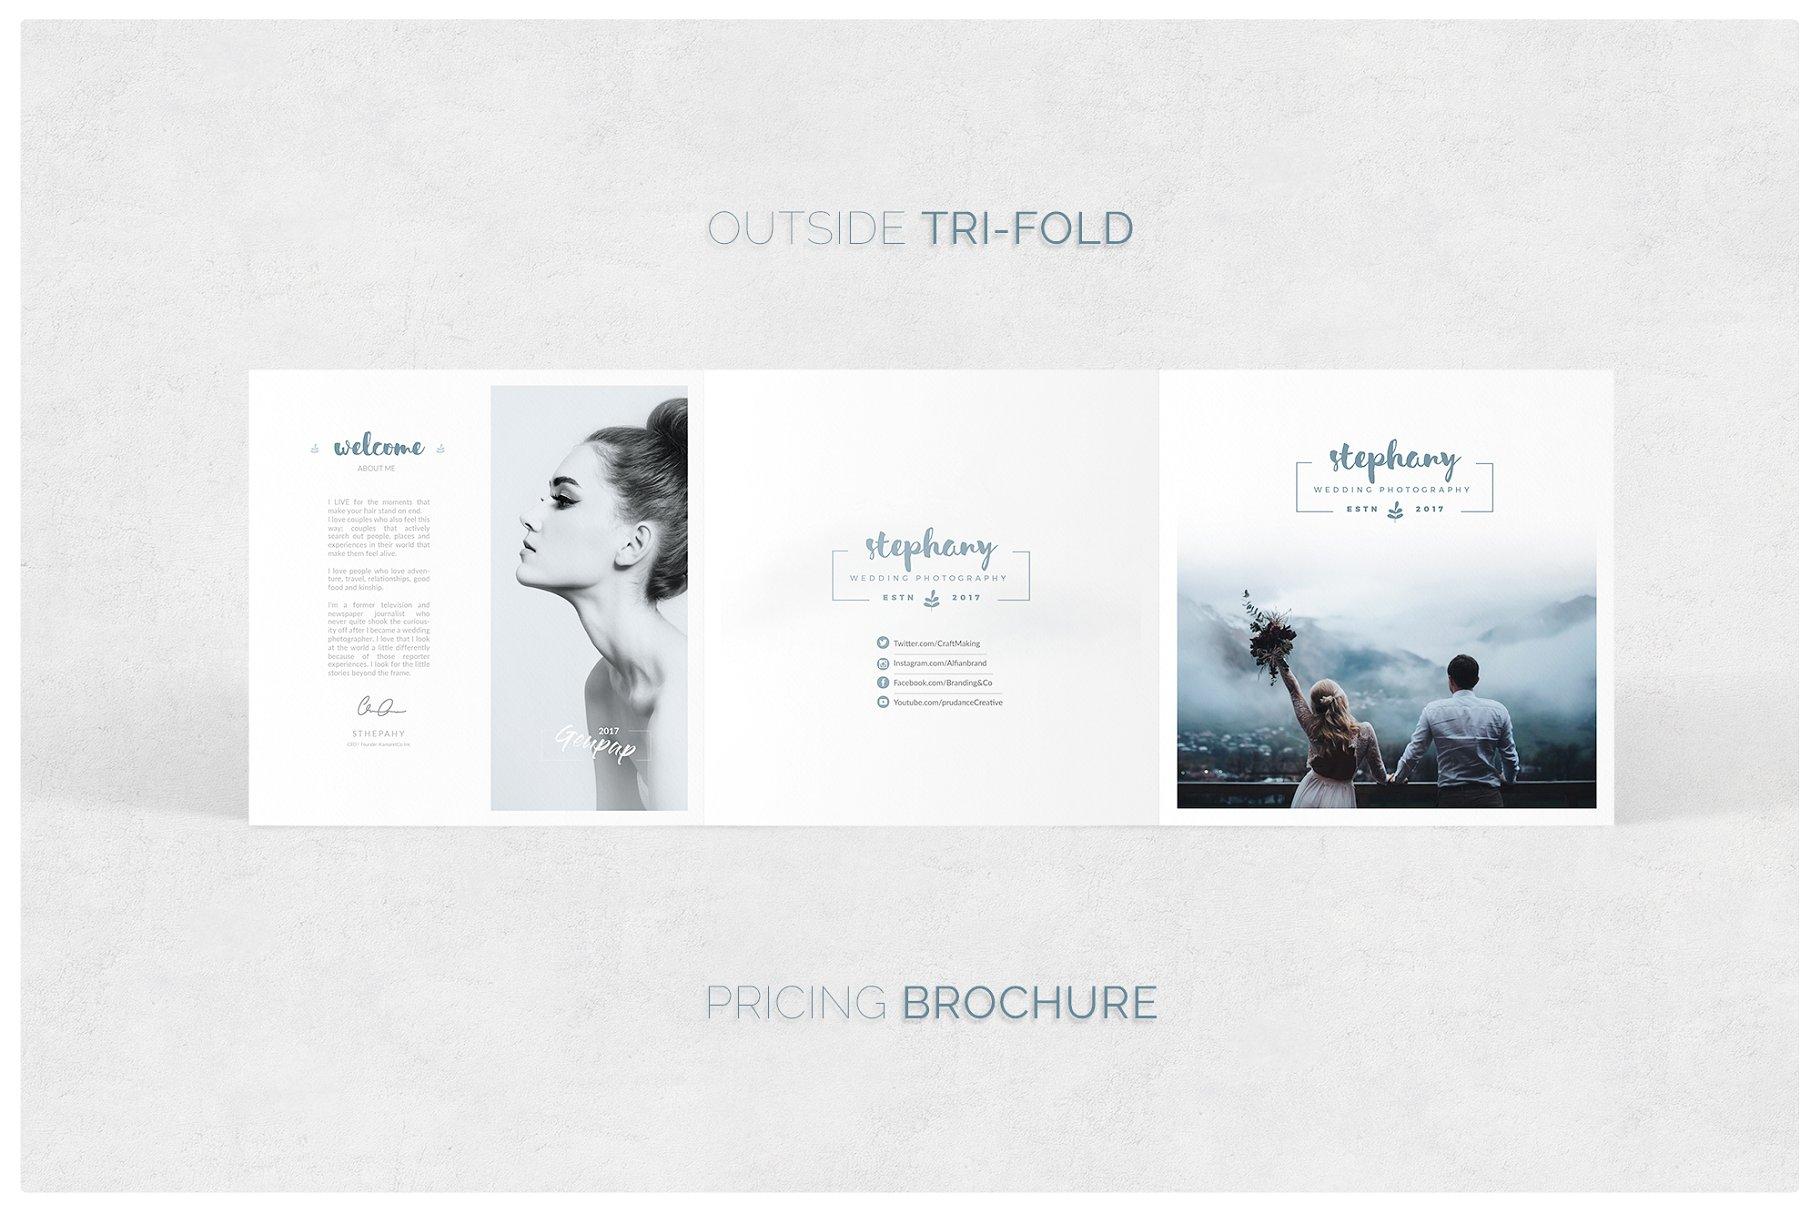 square-pricing-brochure-template-.jpg